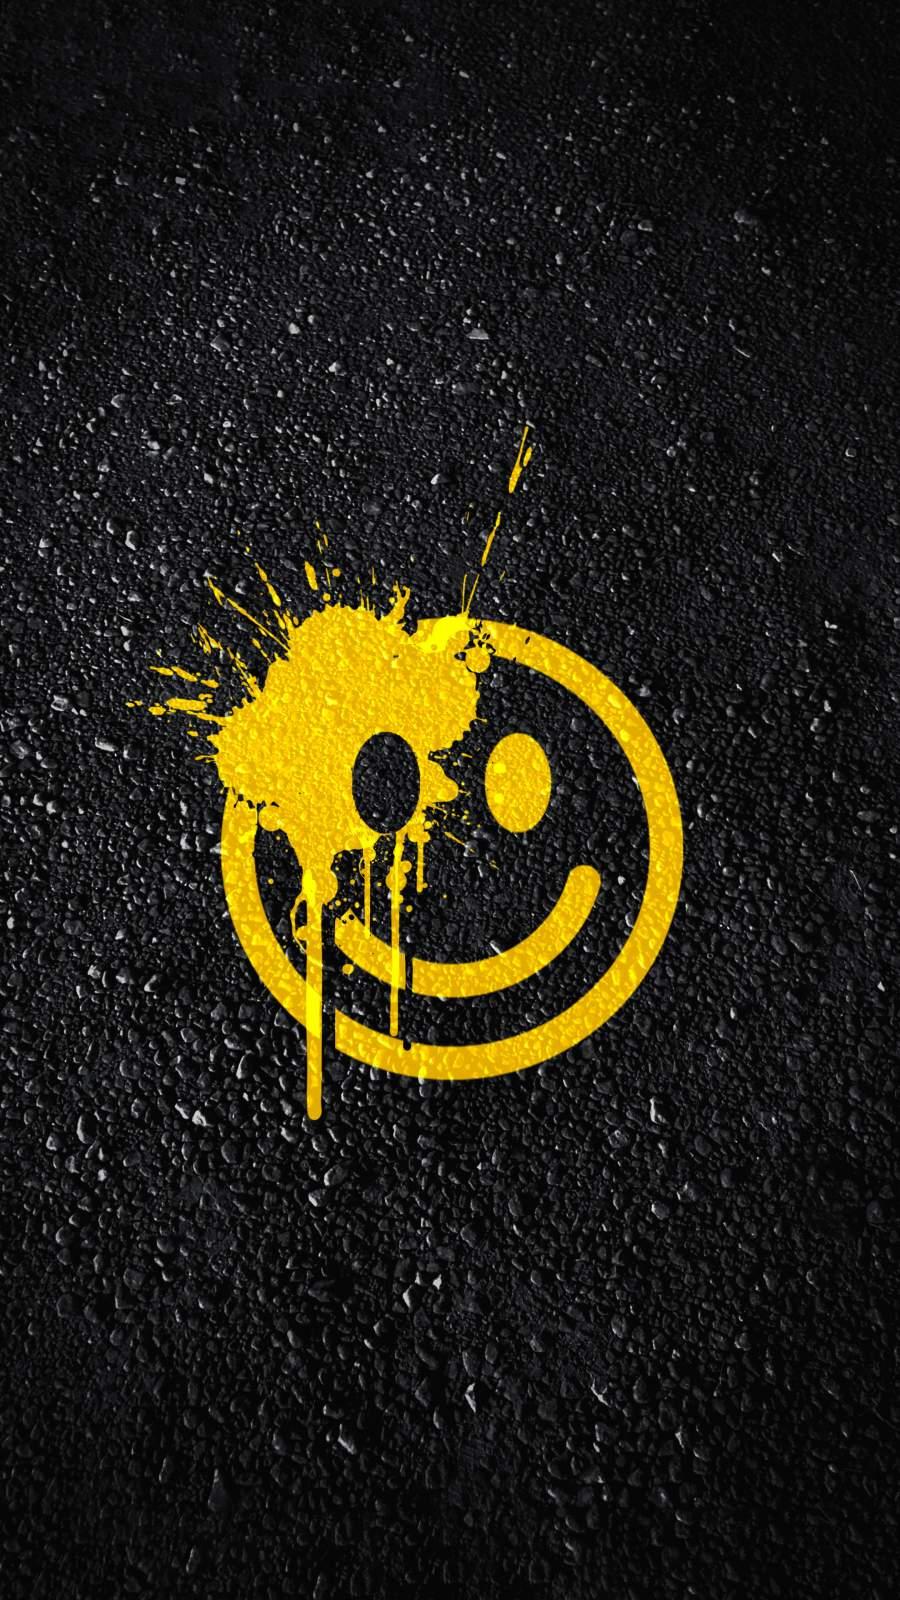 Sad Smile iPhone Wallpaper